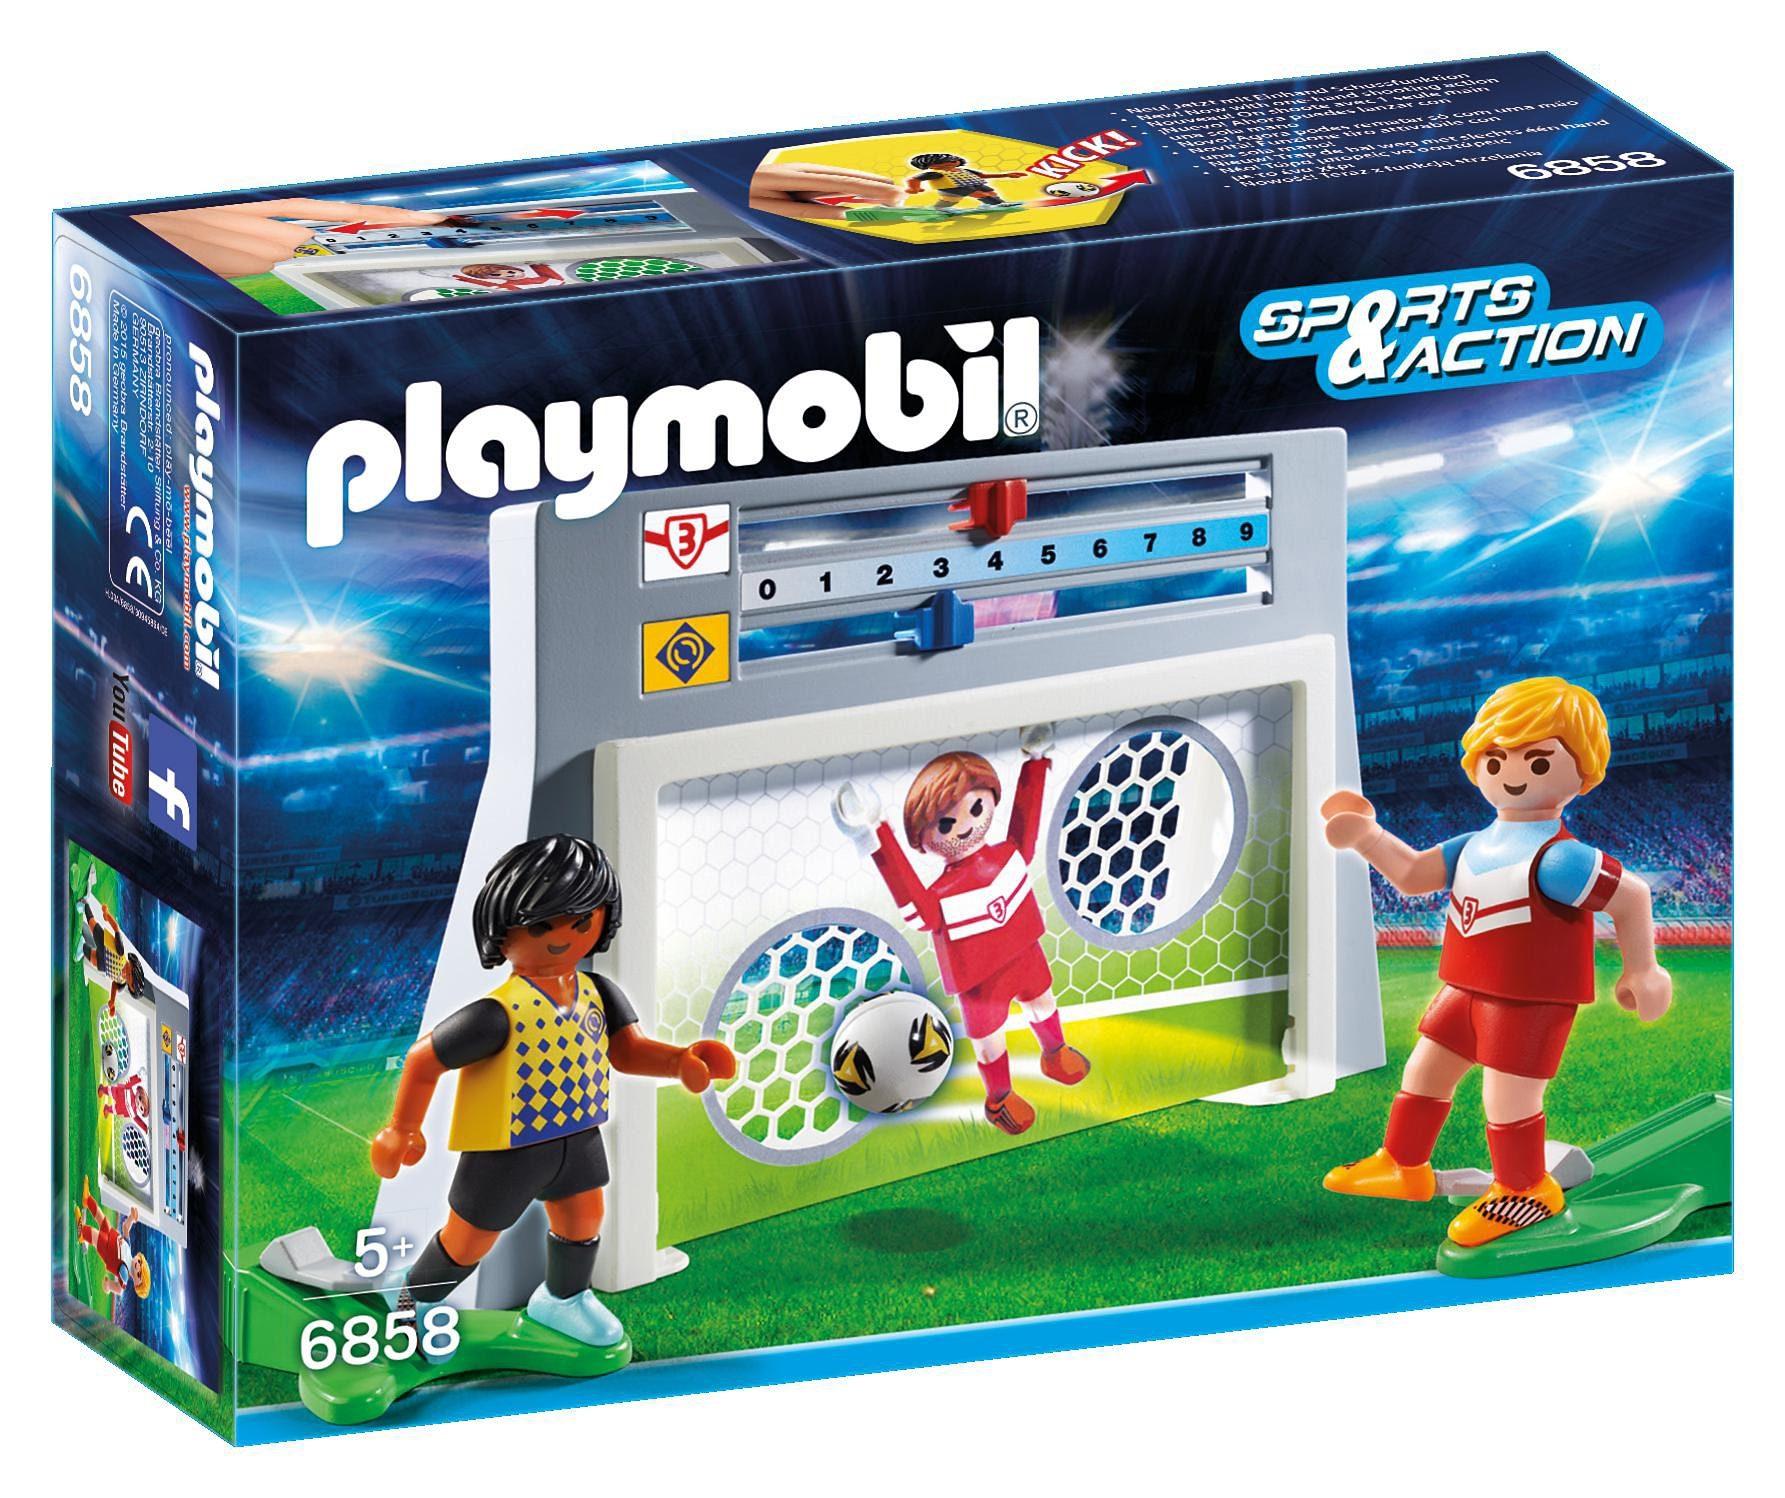 Playmobil® Torwandschießen (6858), Sports & Action